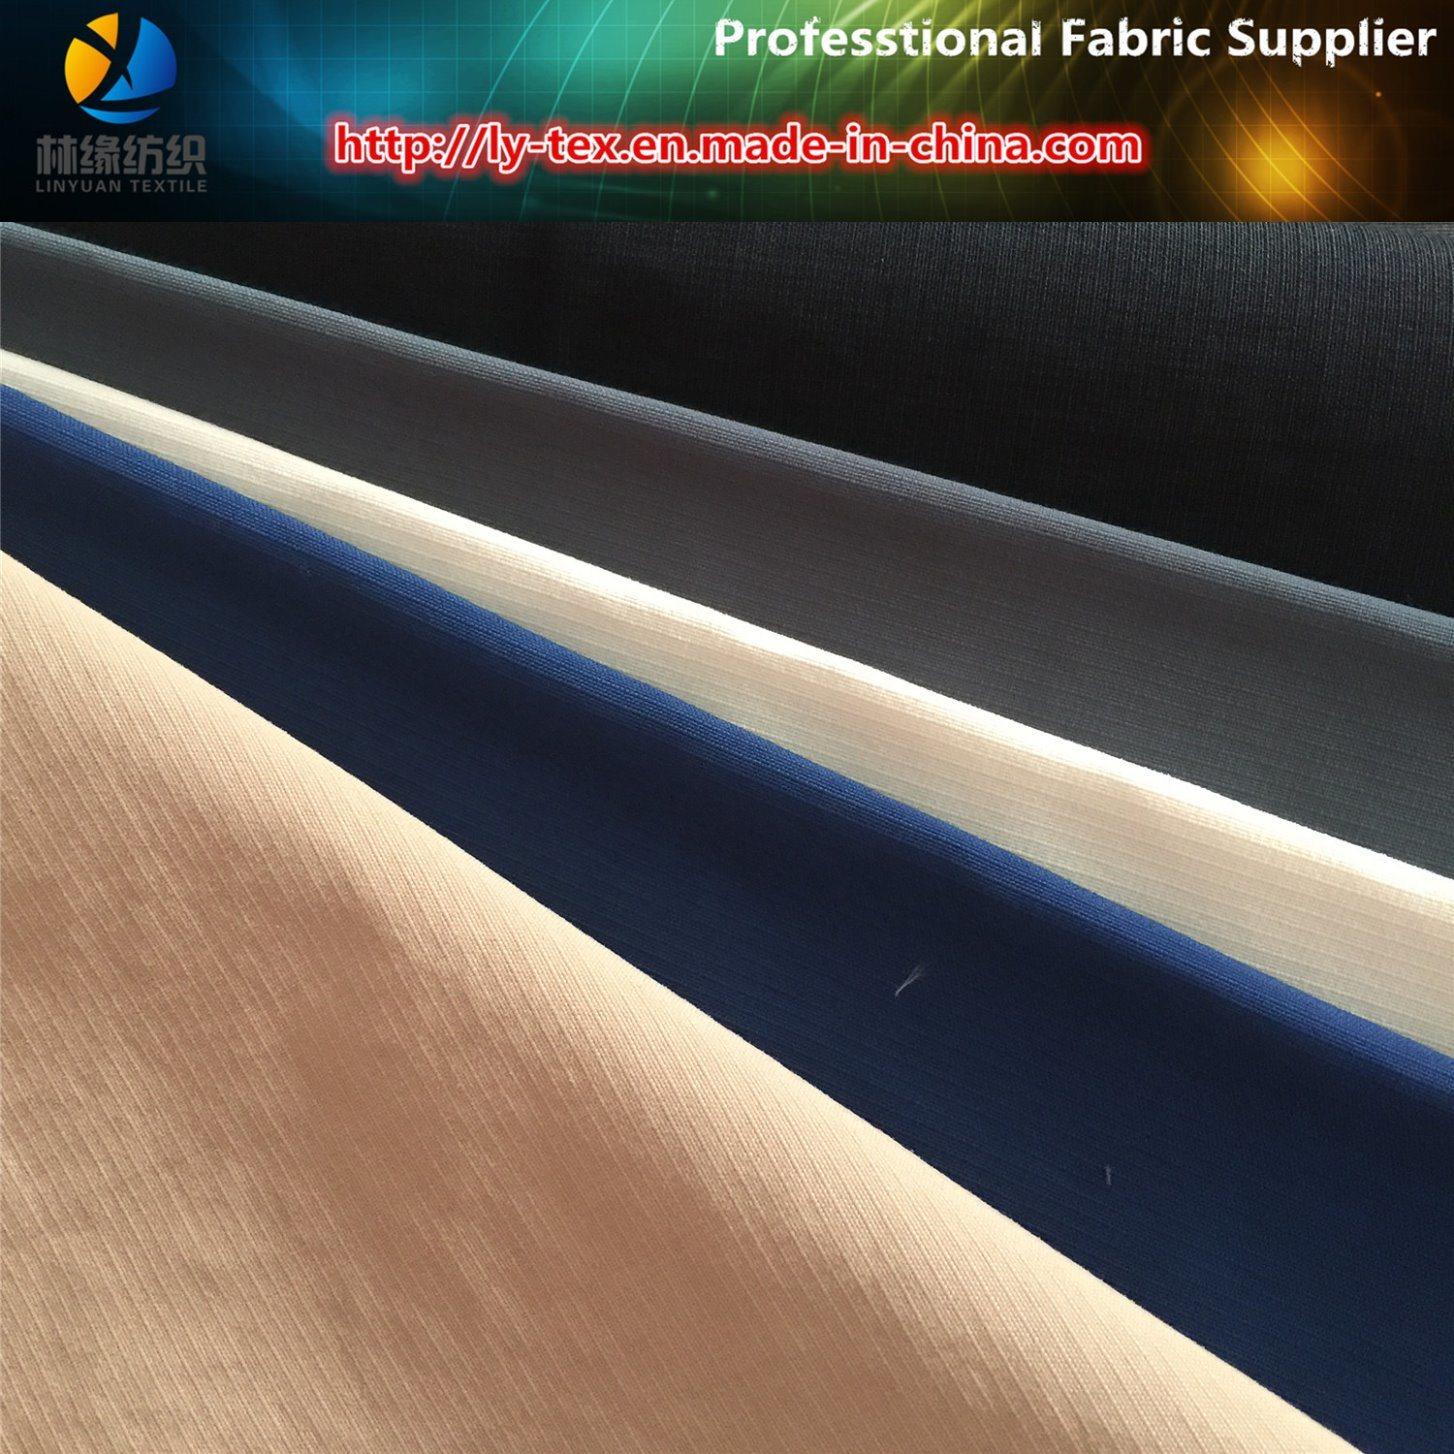 Teflon Nylon Taslon Check Fabric for Garment, Nylon Fabric (LY-R0109)